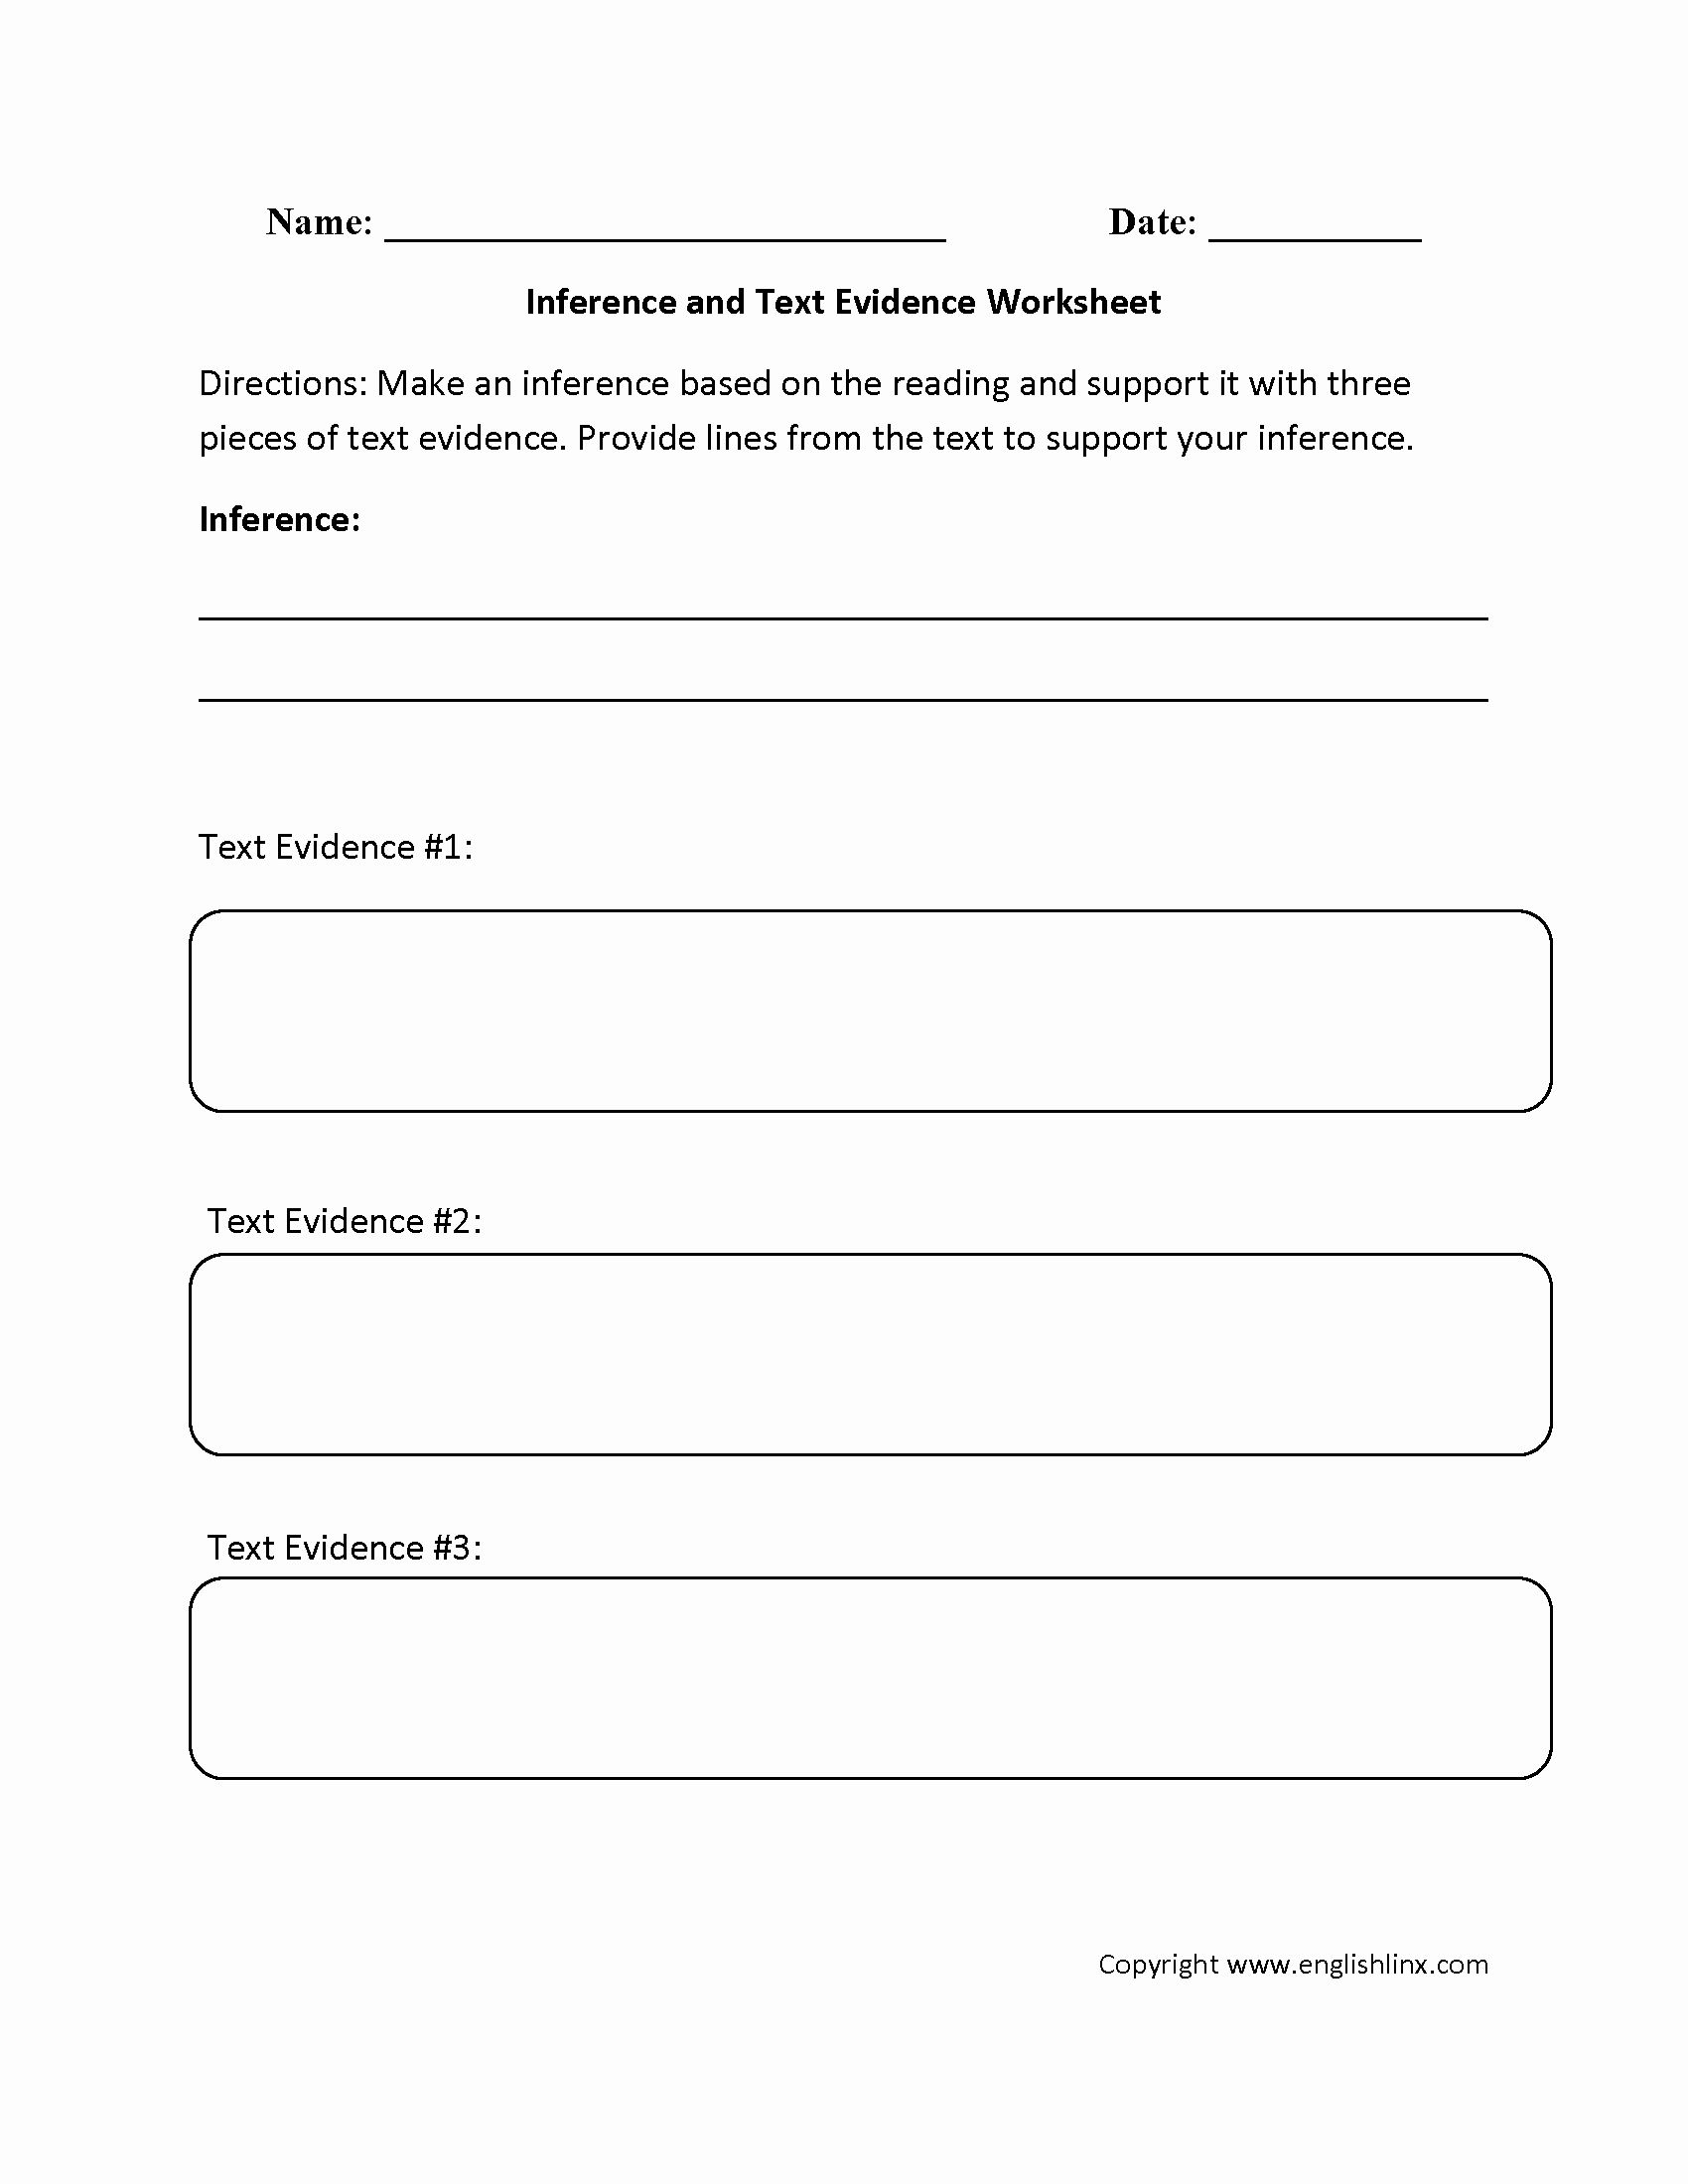 Citing Textual Evidence Worksheet Elegant Citing Textual